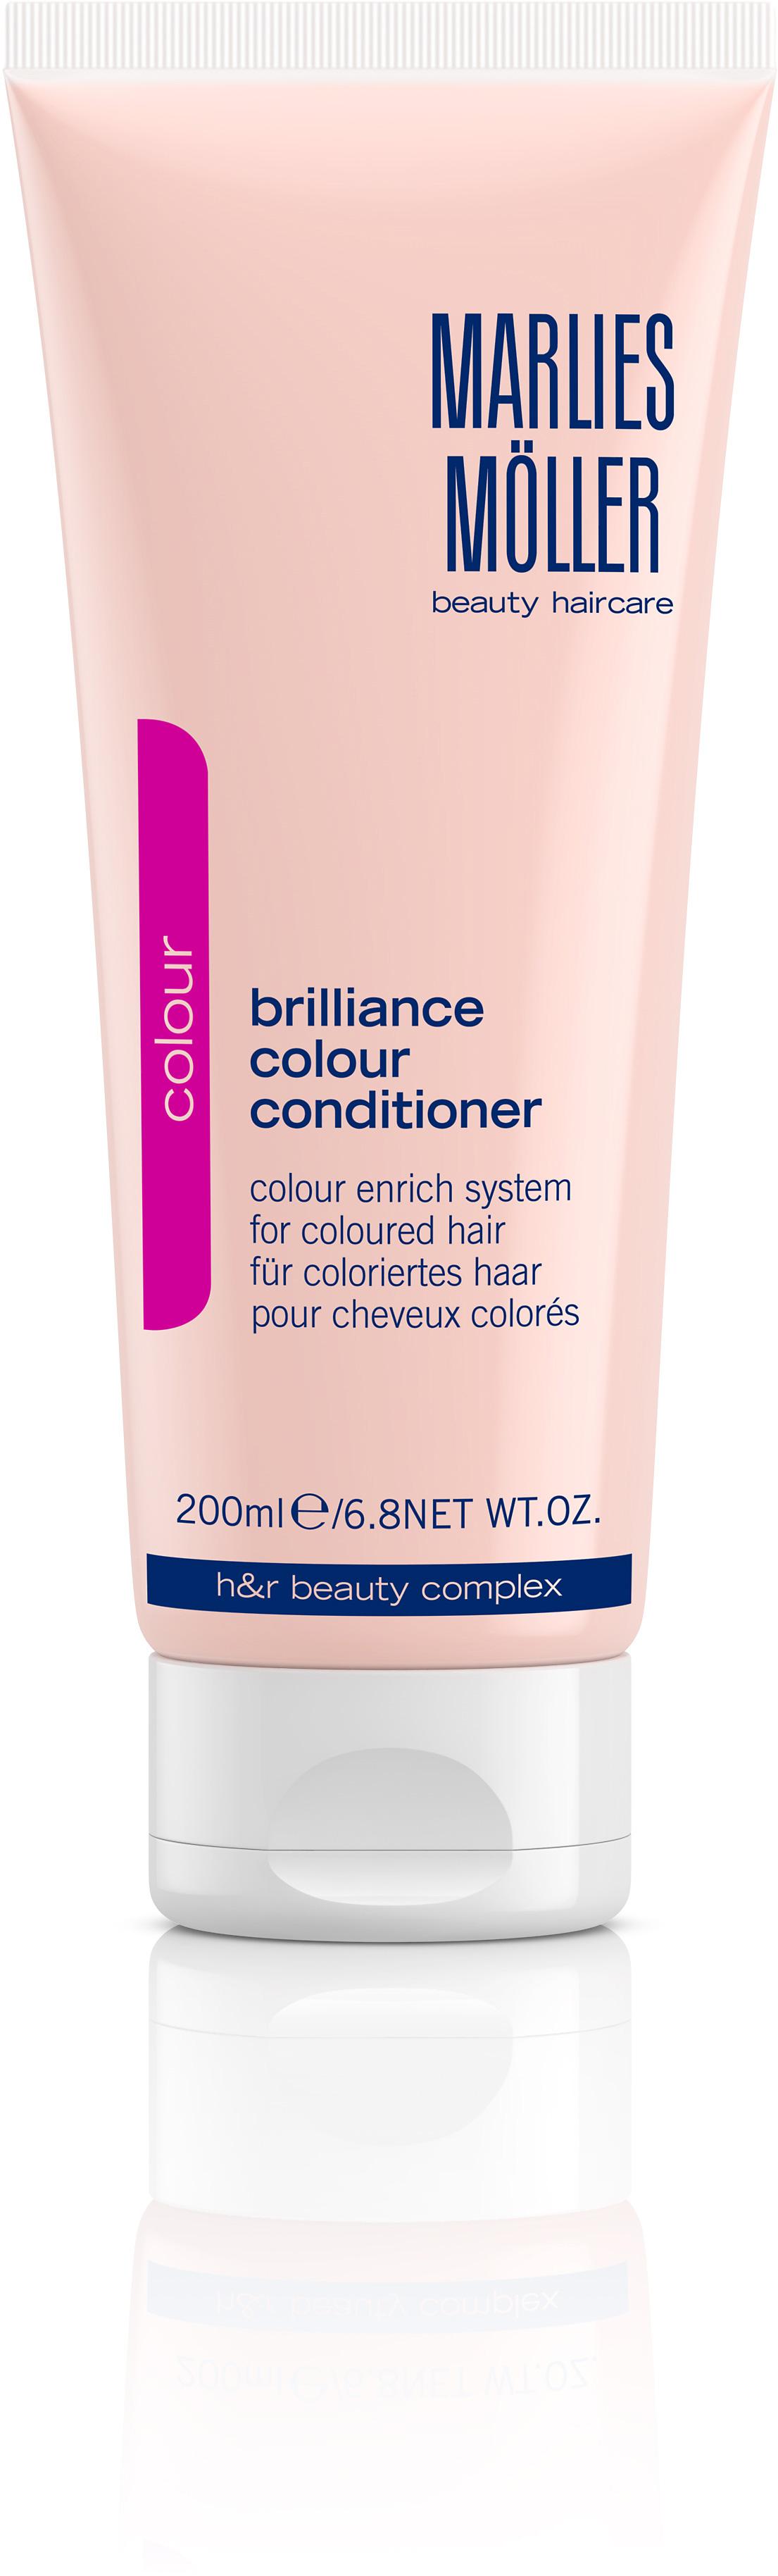 Marlies Möller Clean Brilliance Col Cond 200 ml